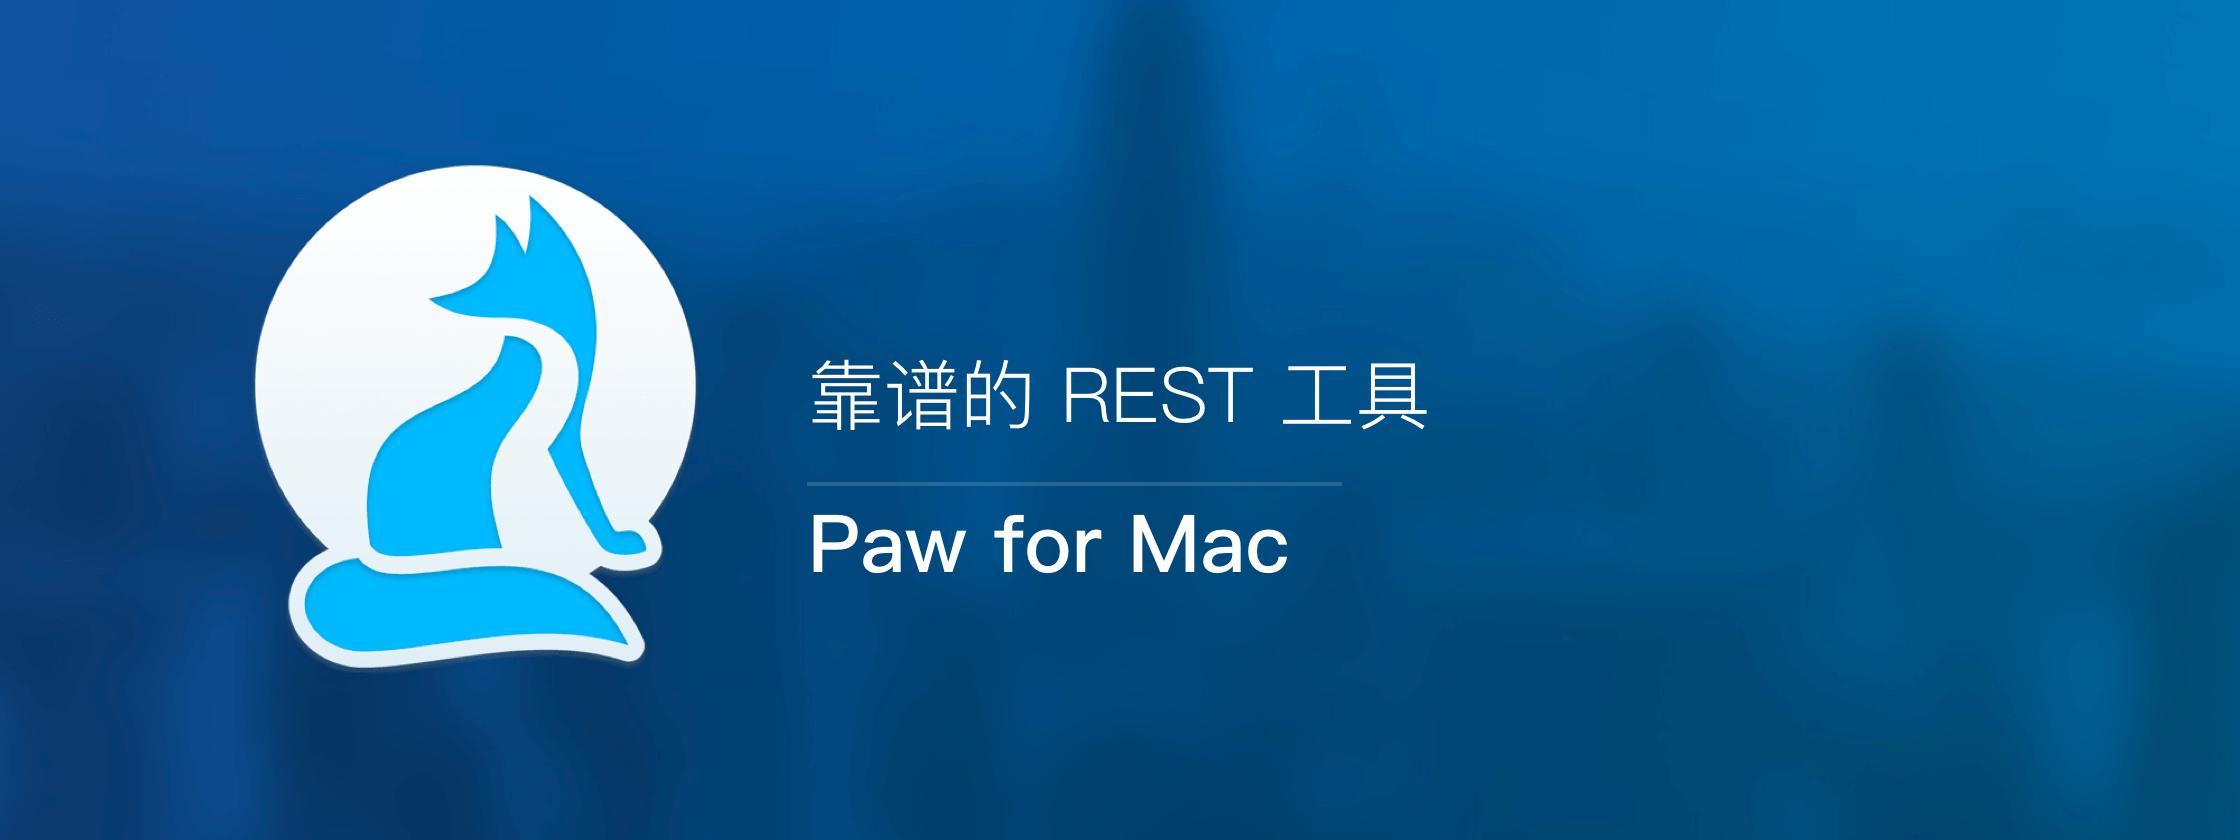 Paw for Mac – 靠谱的 REST 工具